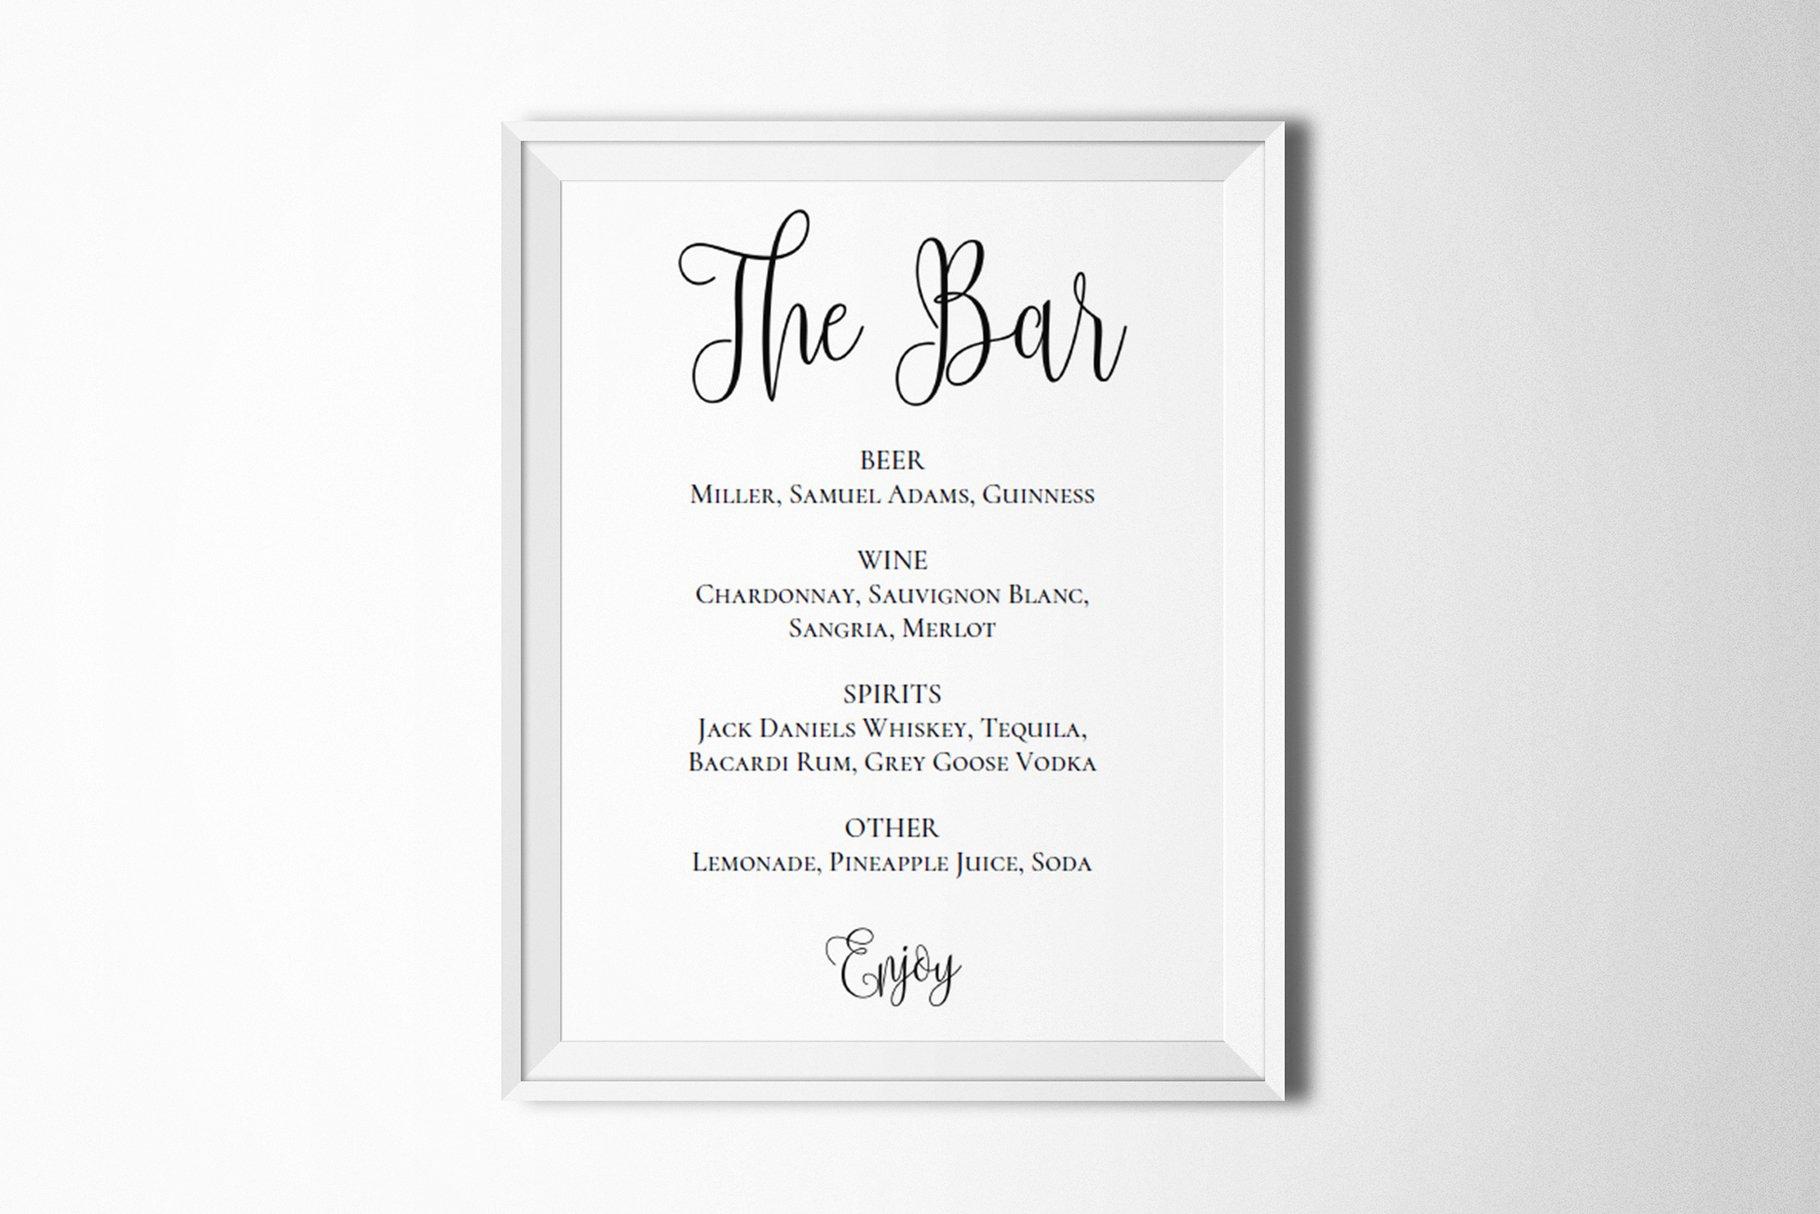 Sports Bar Menu Template Fresh Wedding Bar Menu Template Drink Sign Stationery